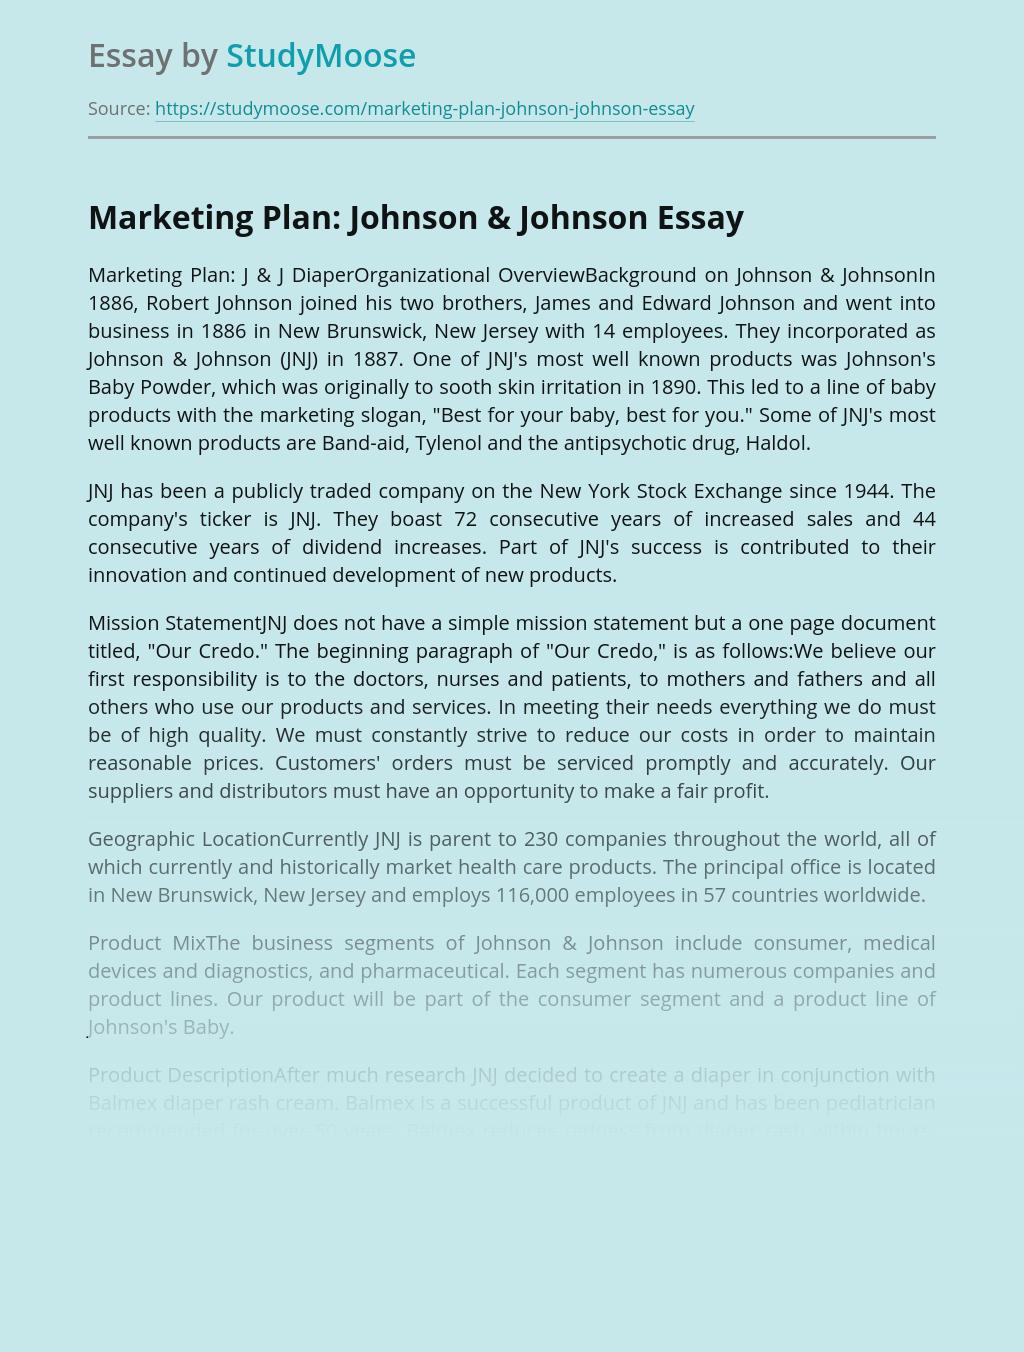 Marketing Plan: Johnson & Johnson